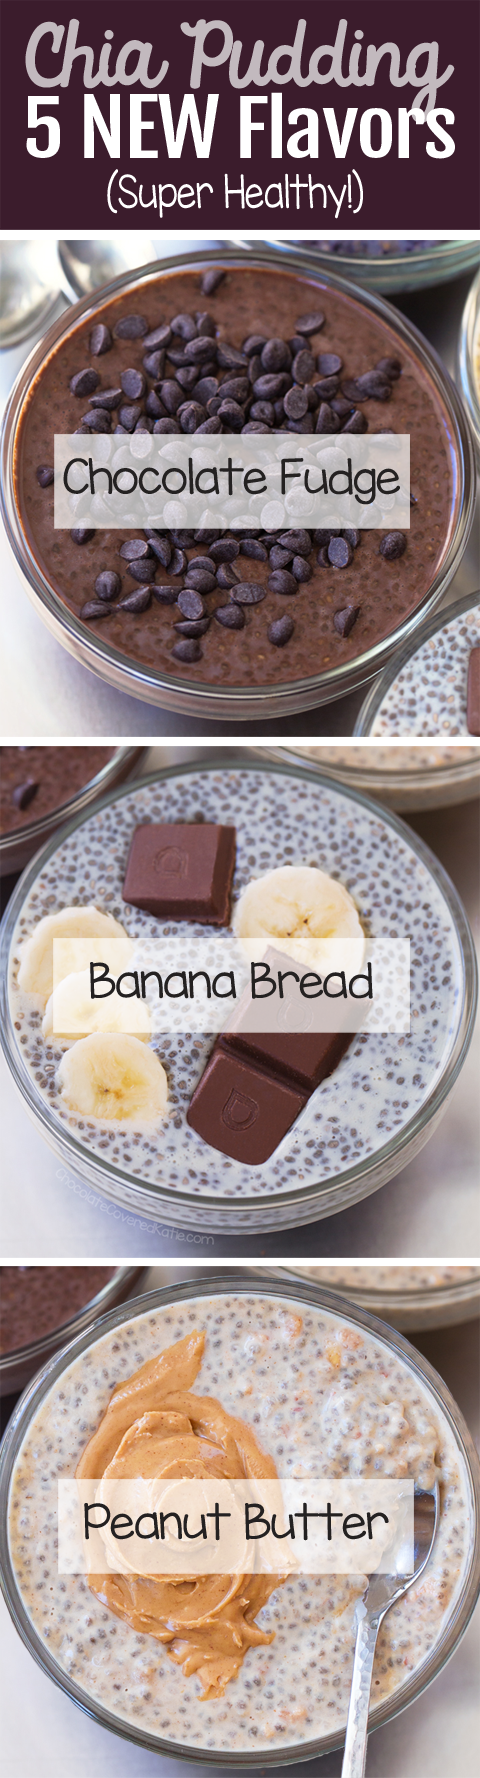 Chia Pudding Recipes (Vegan, Keto, Paleo, Gluten Free)